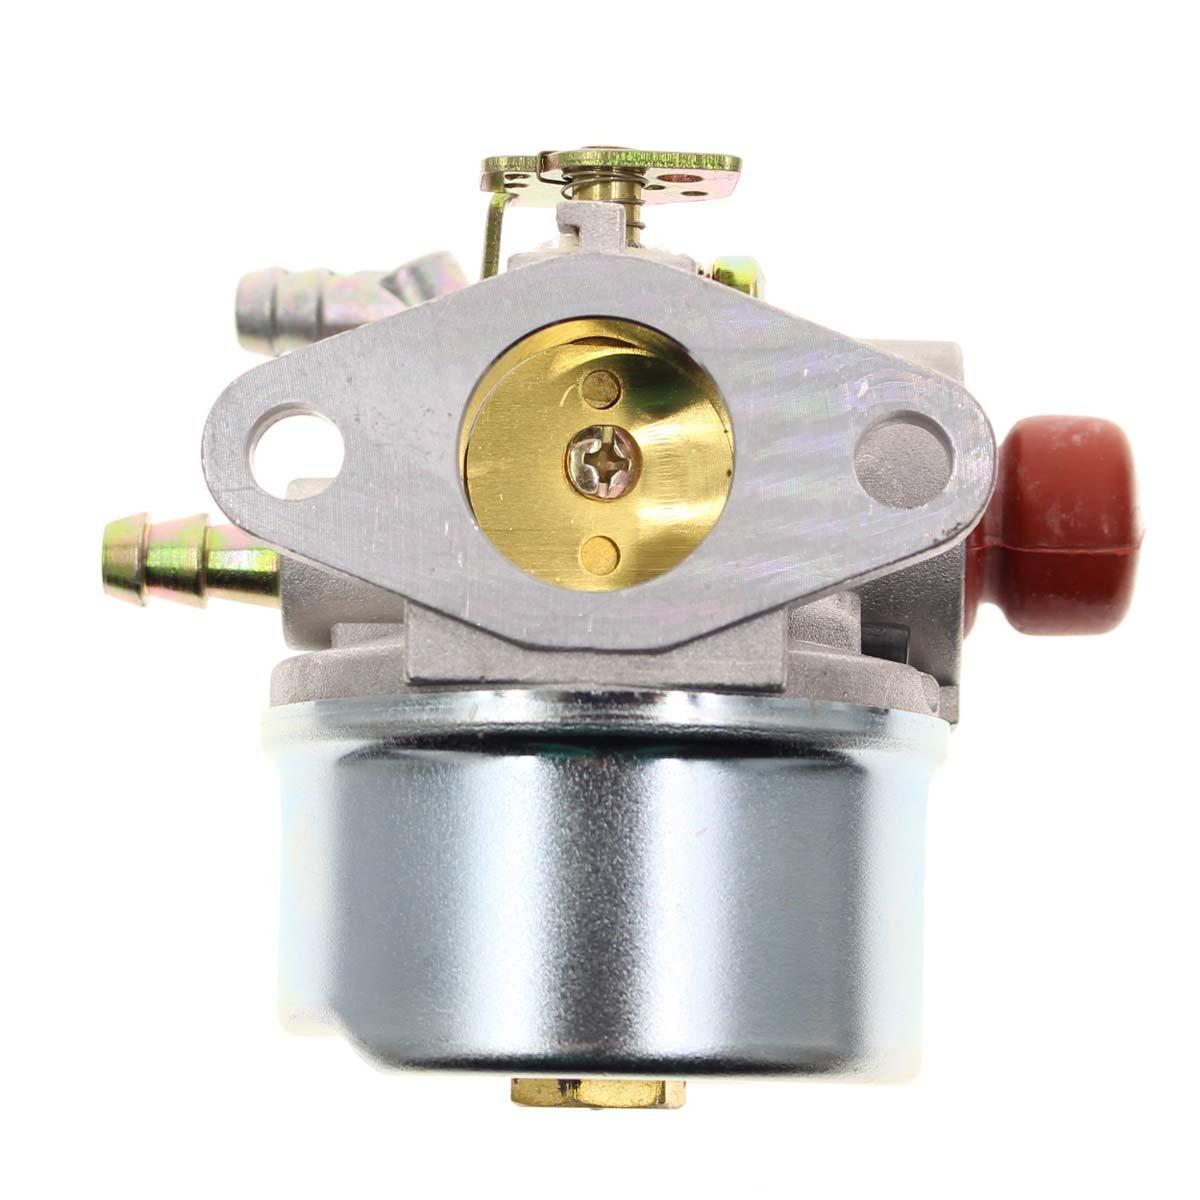 Carbhub Carburetor for Tecumseh 640025 OHH55 OHH60 OHH65 Carbour